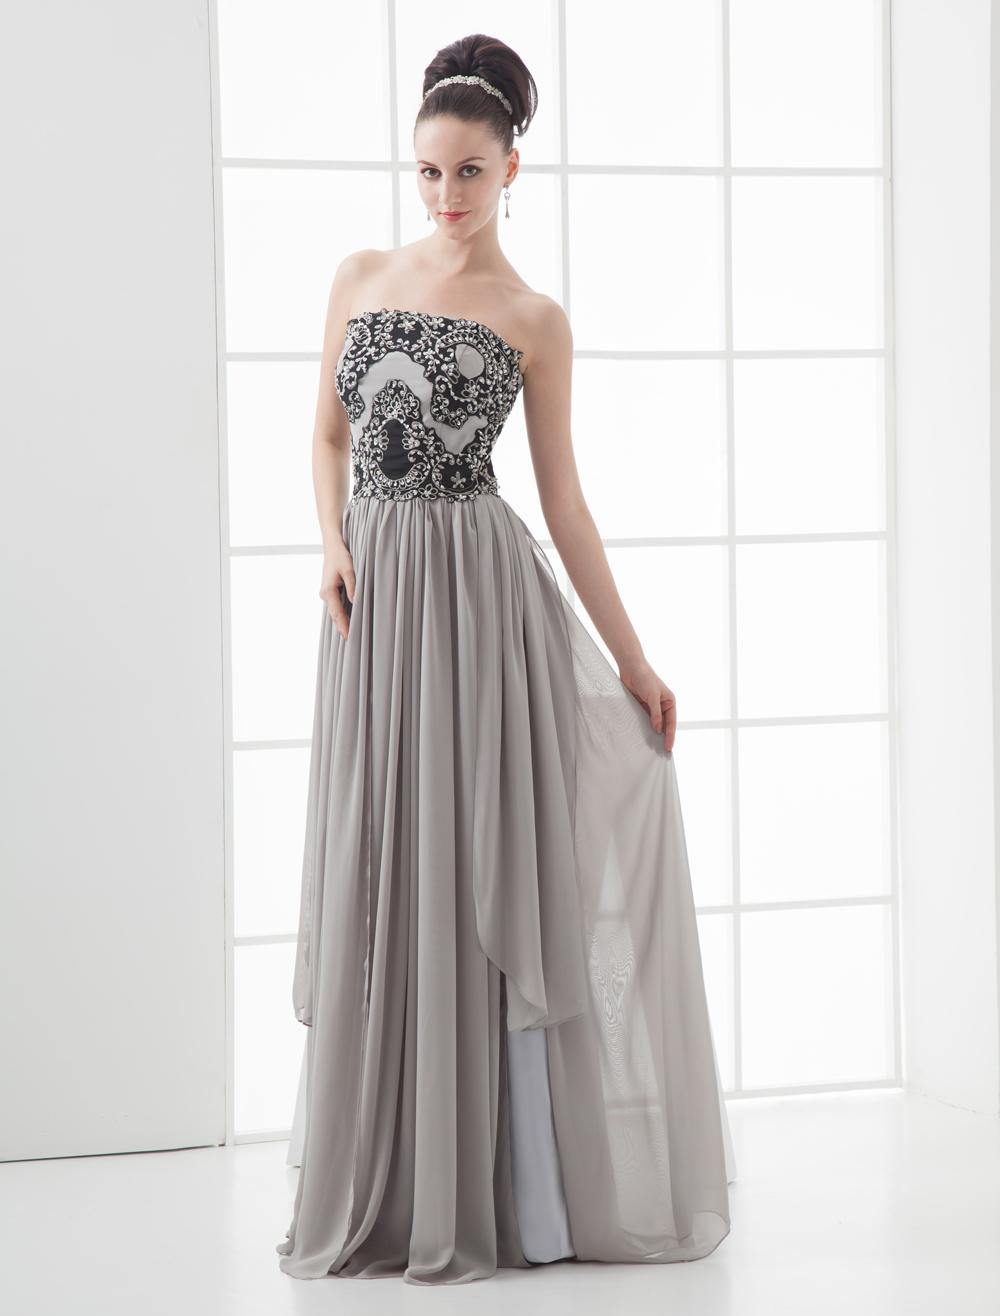 Grace Gray Chiffon Strapless Paillette Decoration Prom Dress (Wedding Evening Dresses) photo